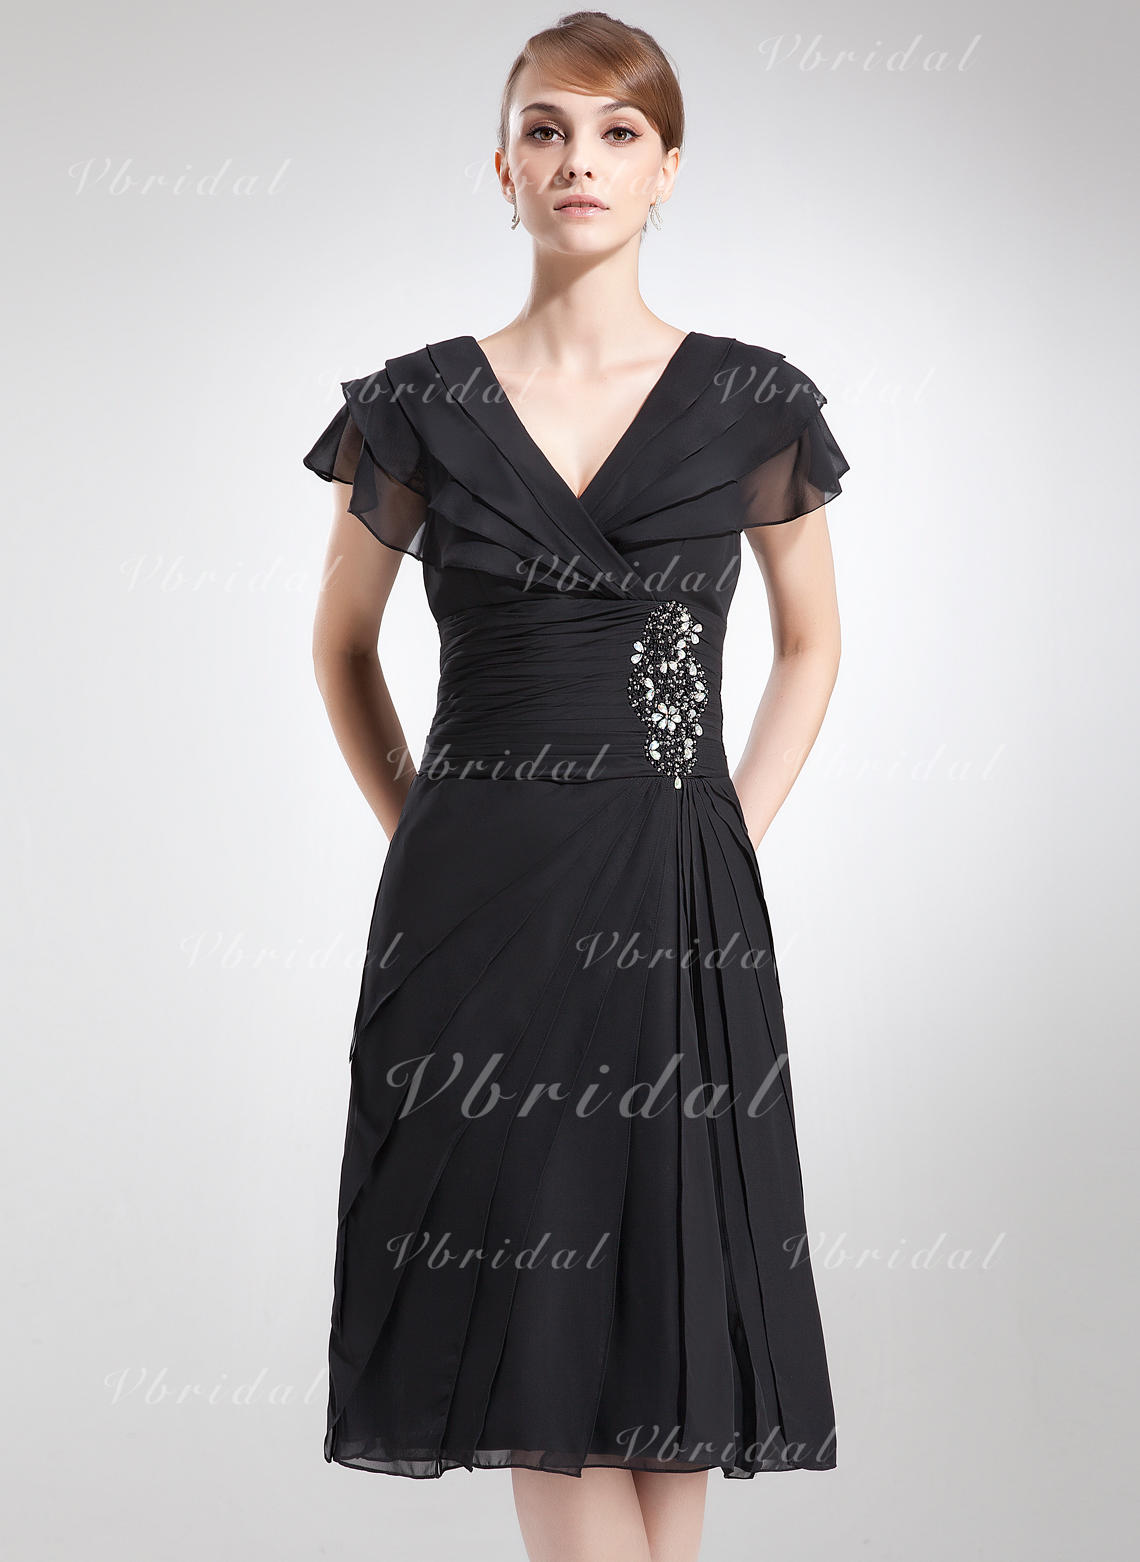 2157ab39d966df A-Line/Princess V-neck Knee-Length Chiffon Mother of the Bride Dress With  Beading Cascading Ruffles (008006041)